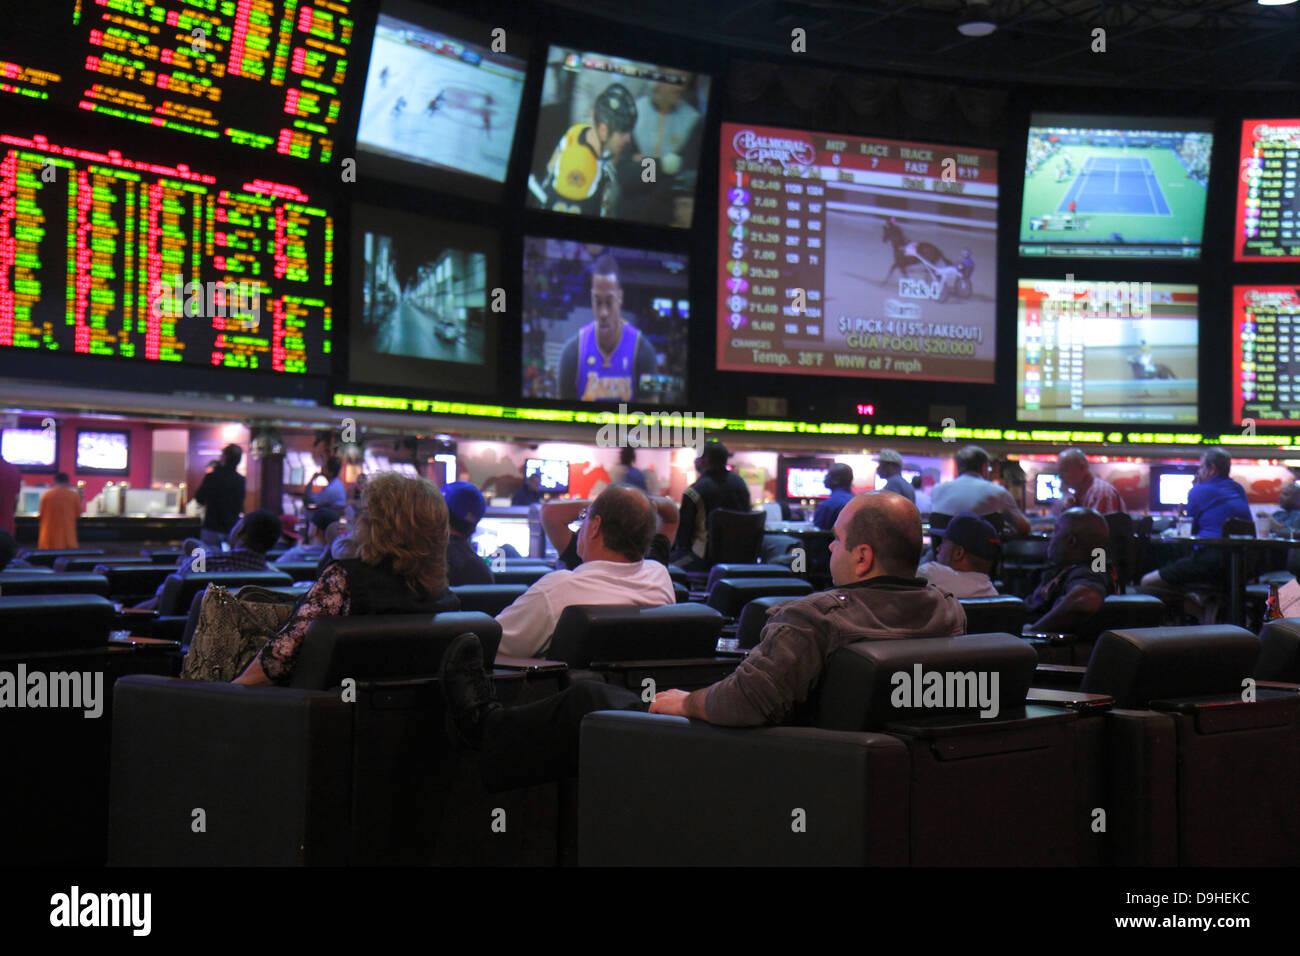 Lvh sports betting prop odds chiellini juventus livorno betting